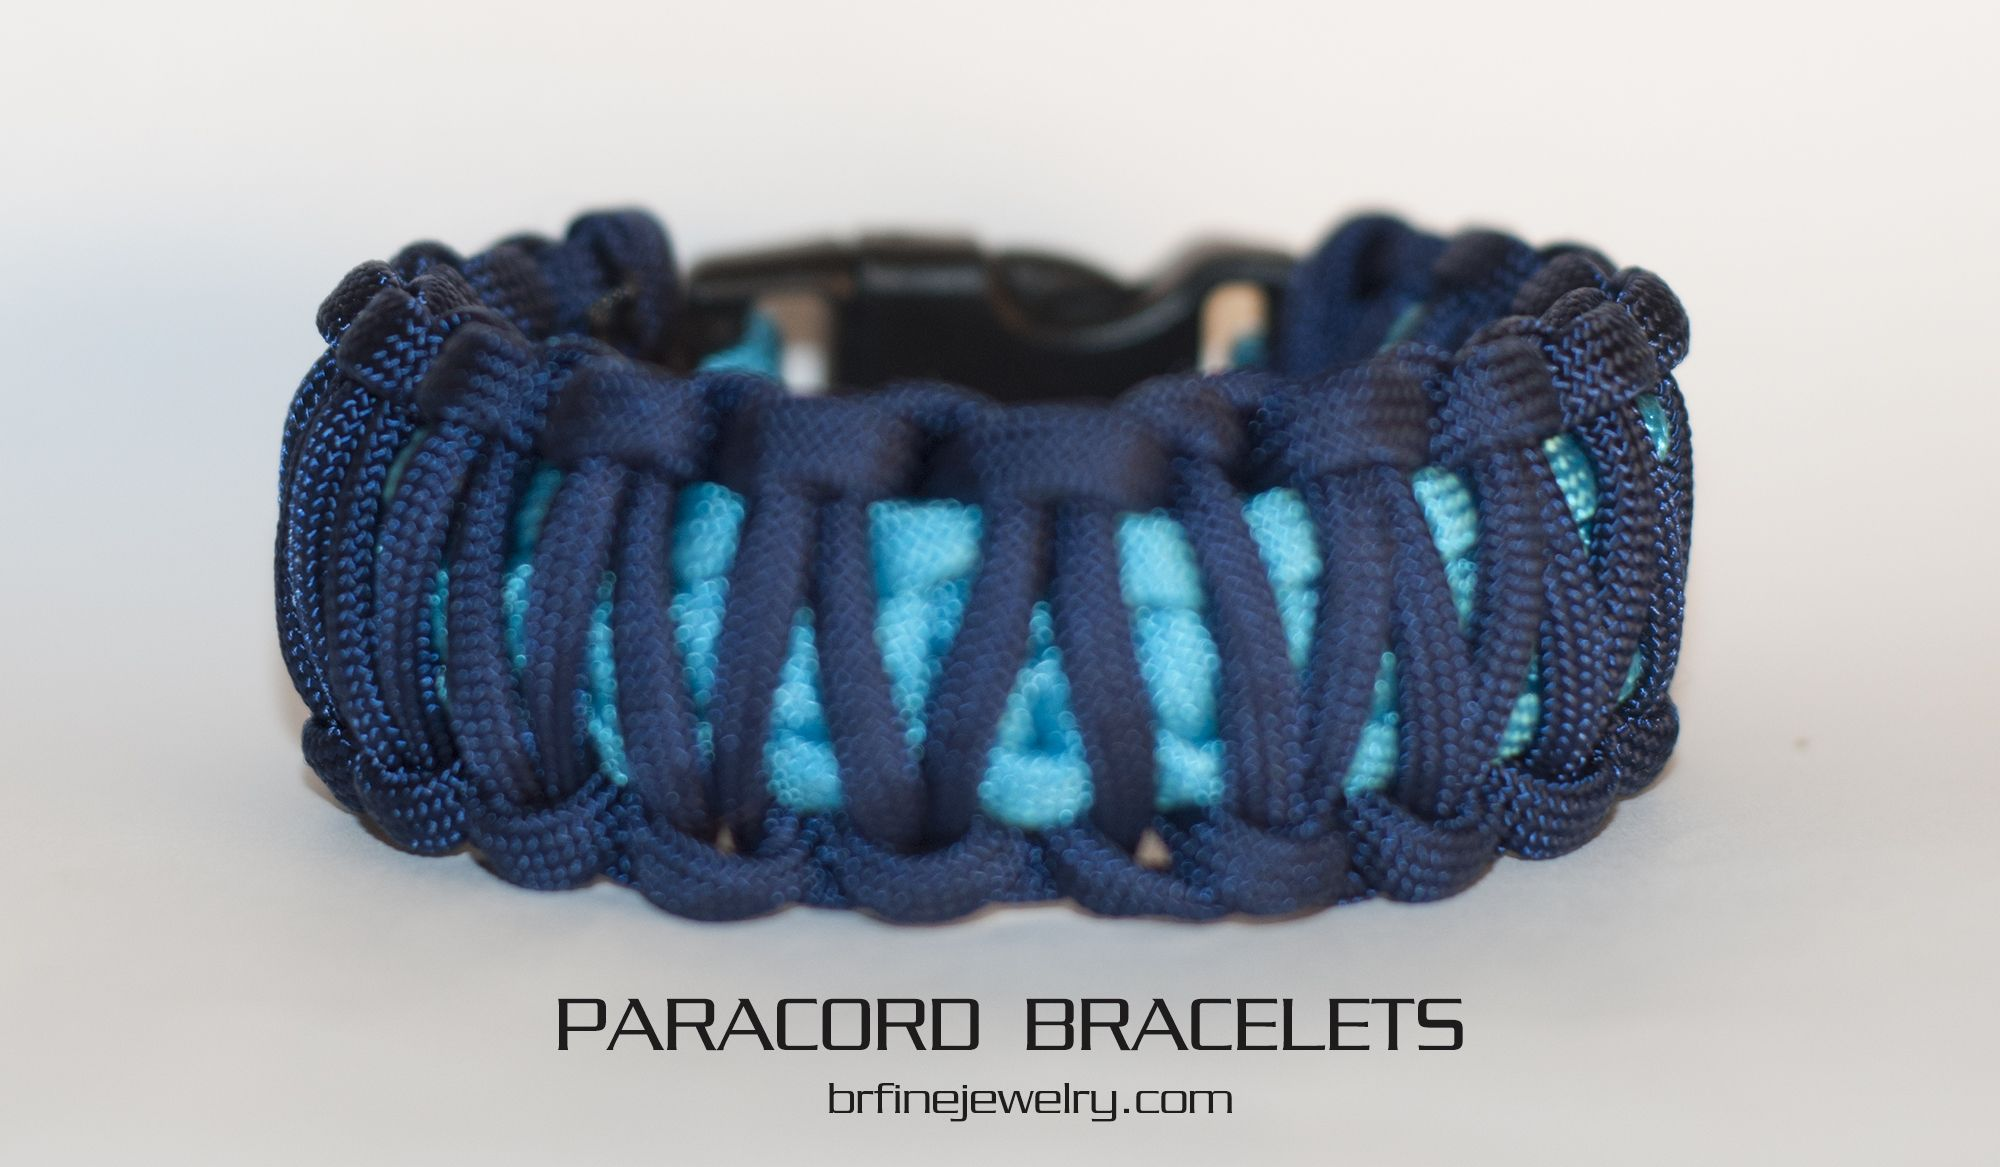 King Cobra Bright Blue And Navy Blue Paracord Bracelet